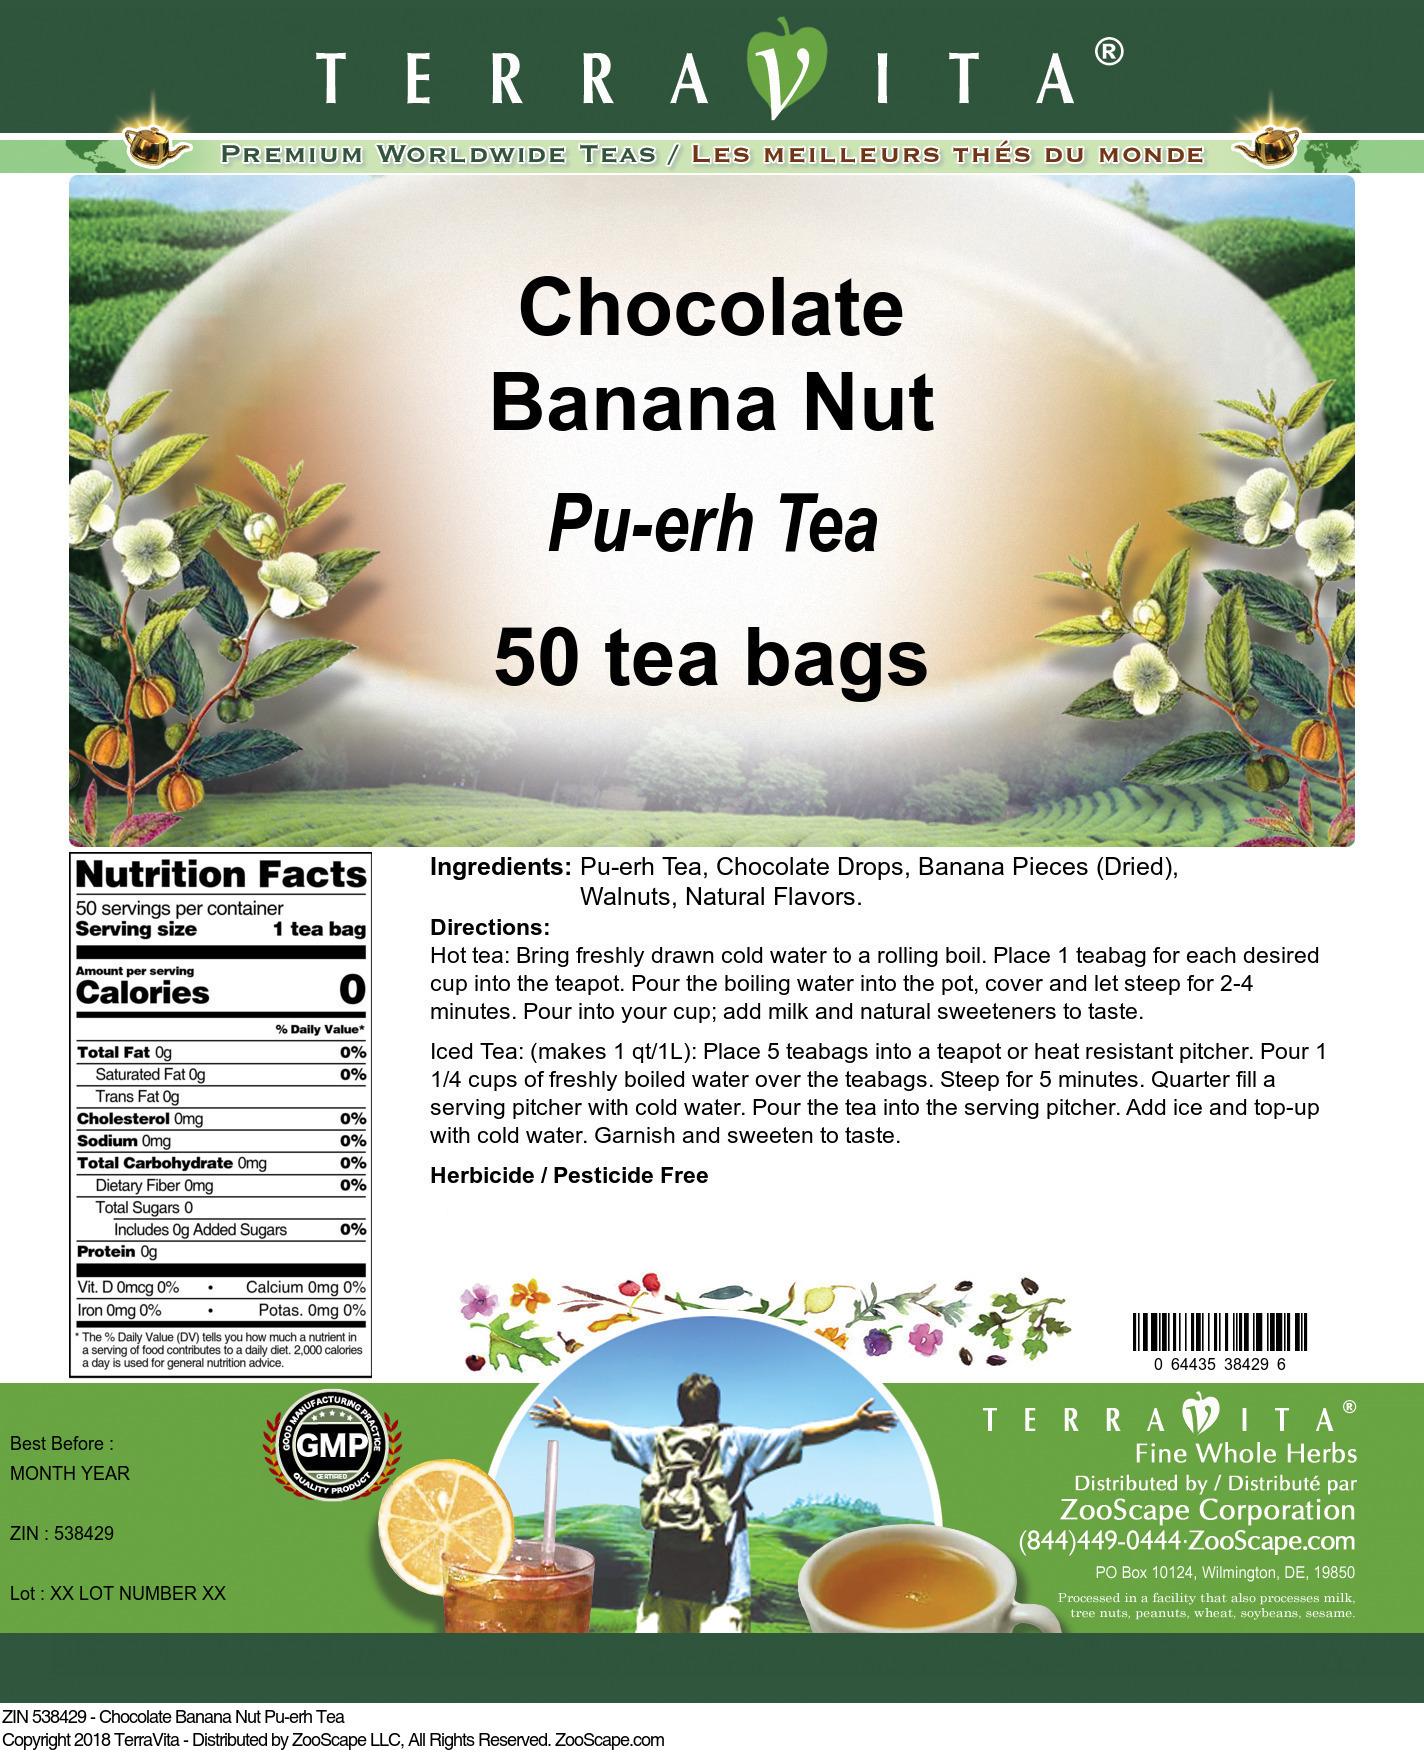 Chocolate Banana Nut Pu-erh Tea